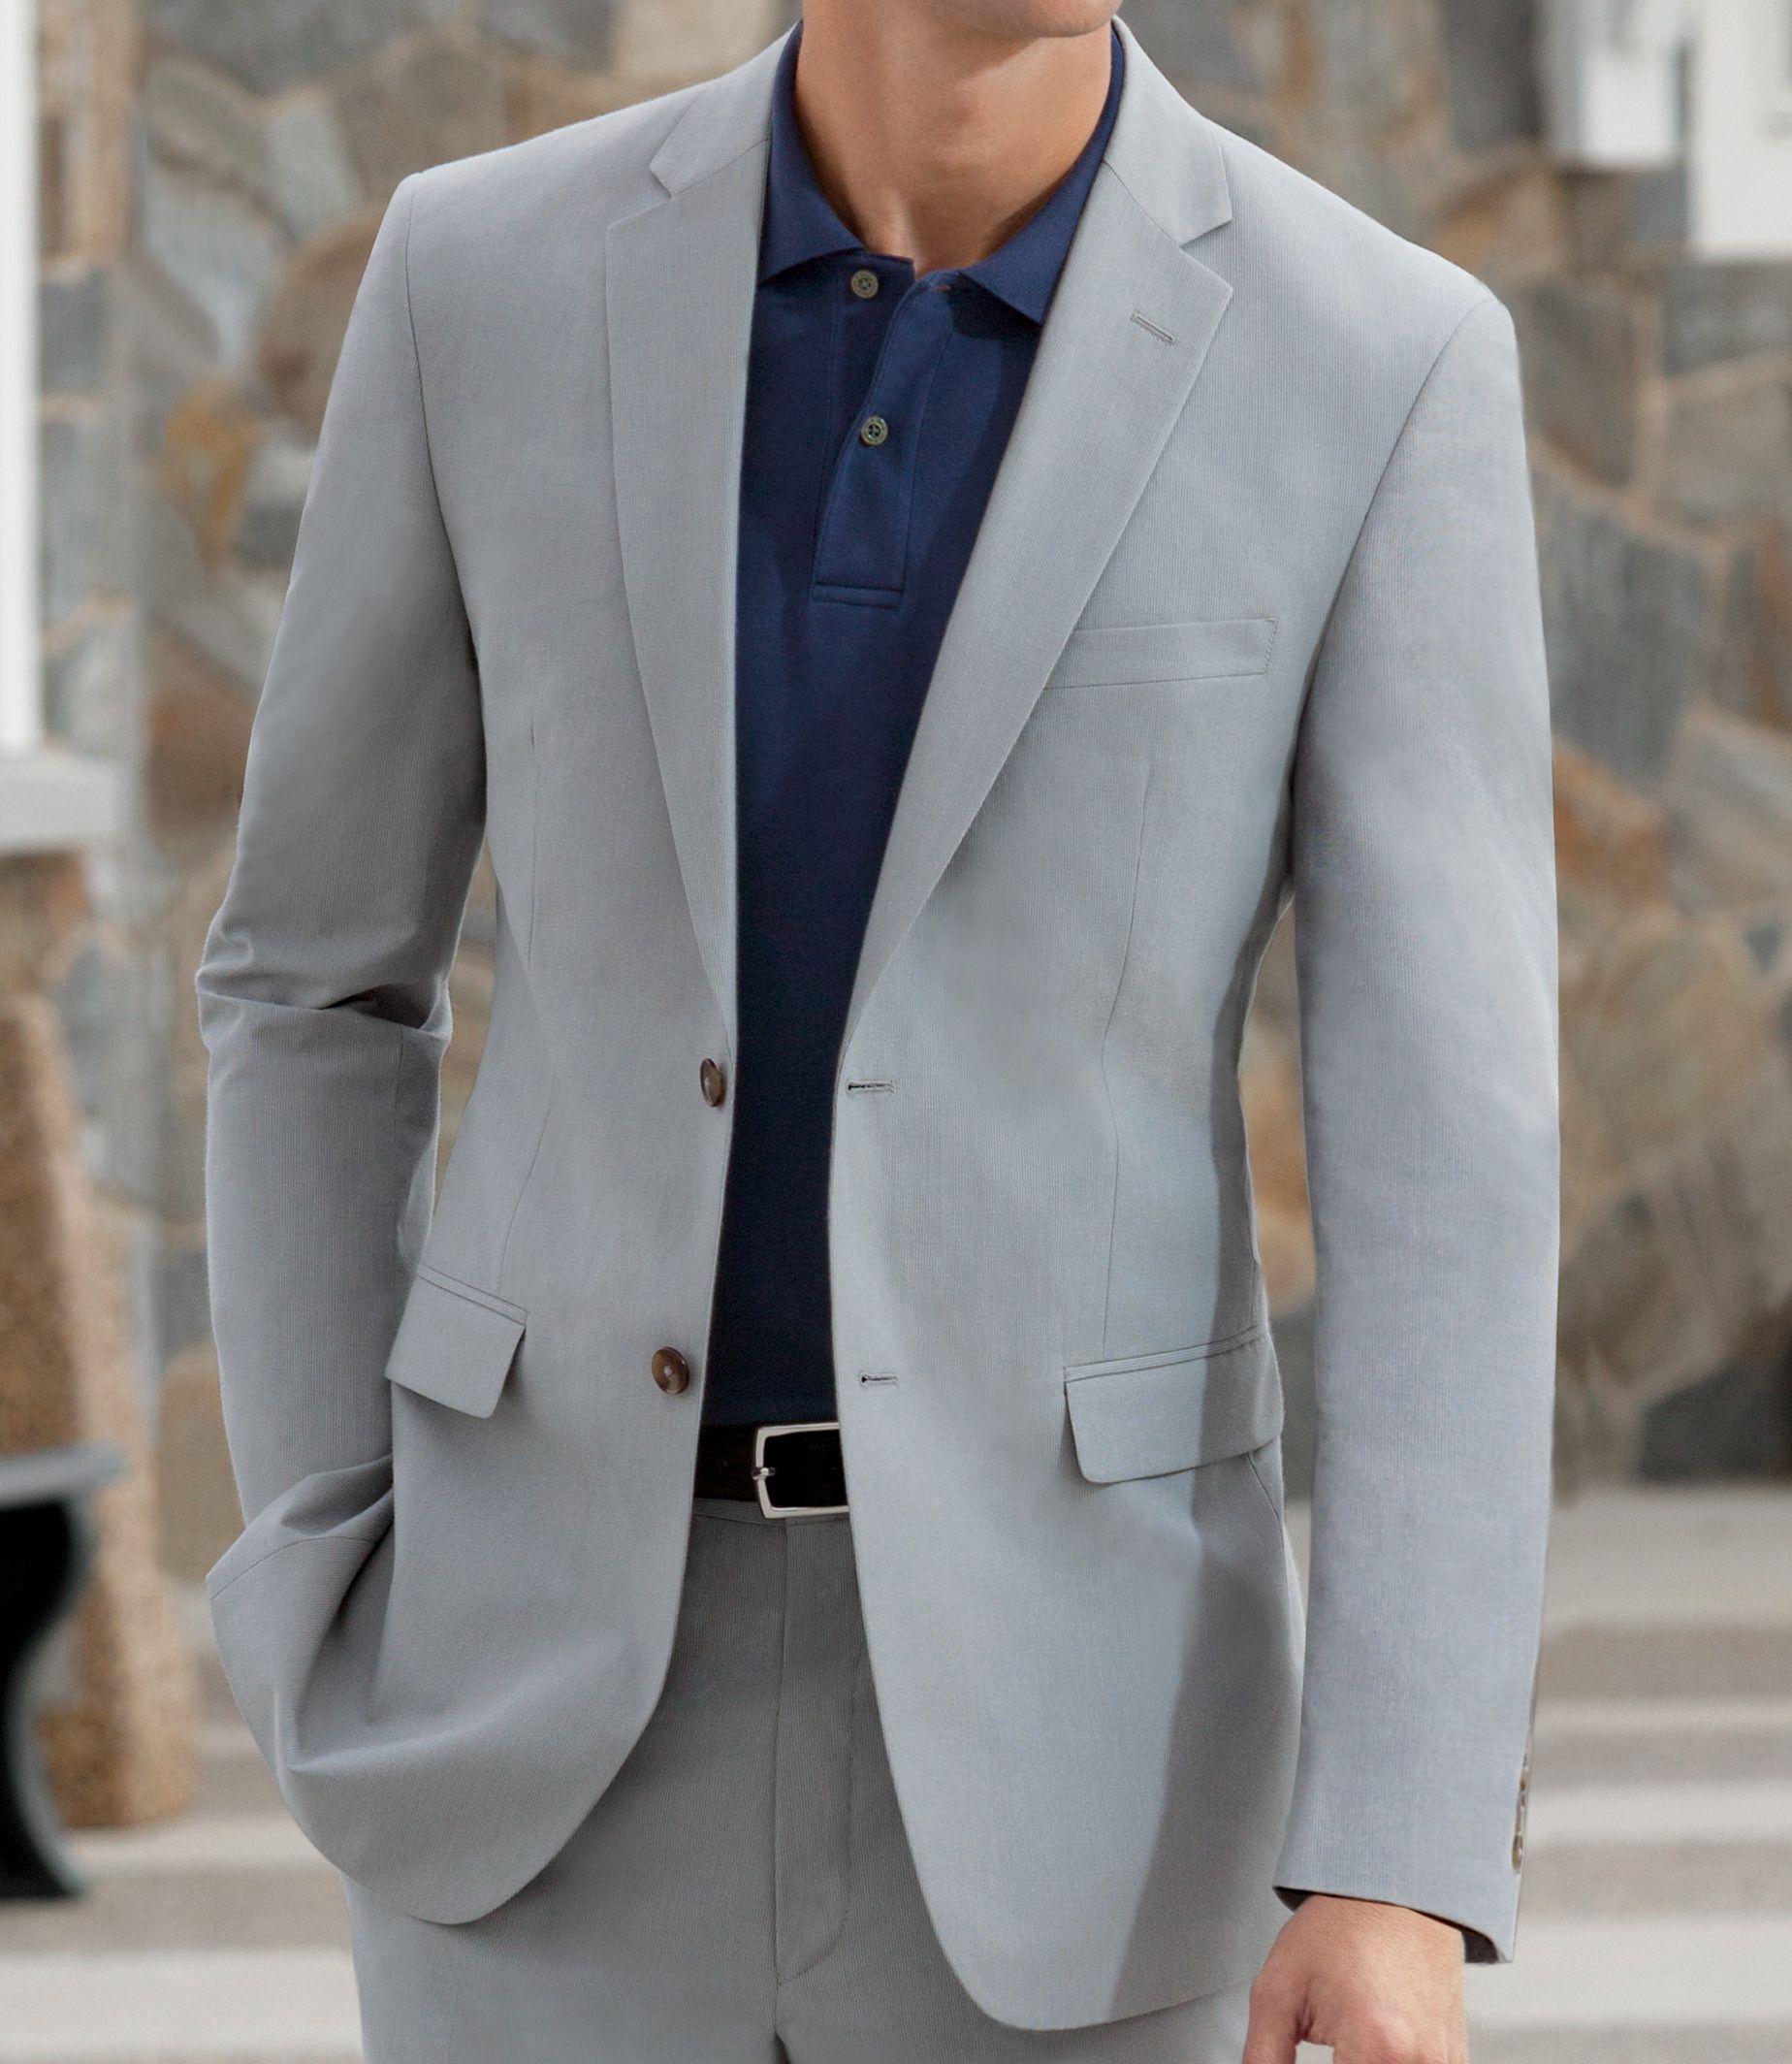 Clearance Suits | Men's | JoS. A. Bank Clothiers